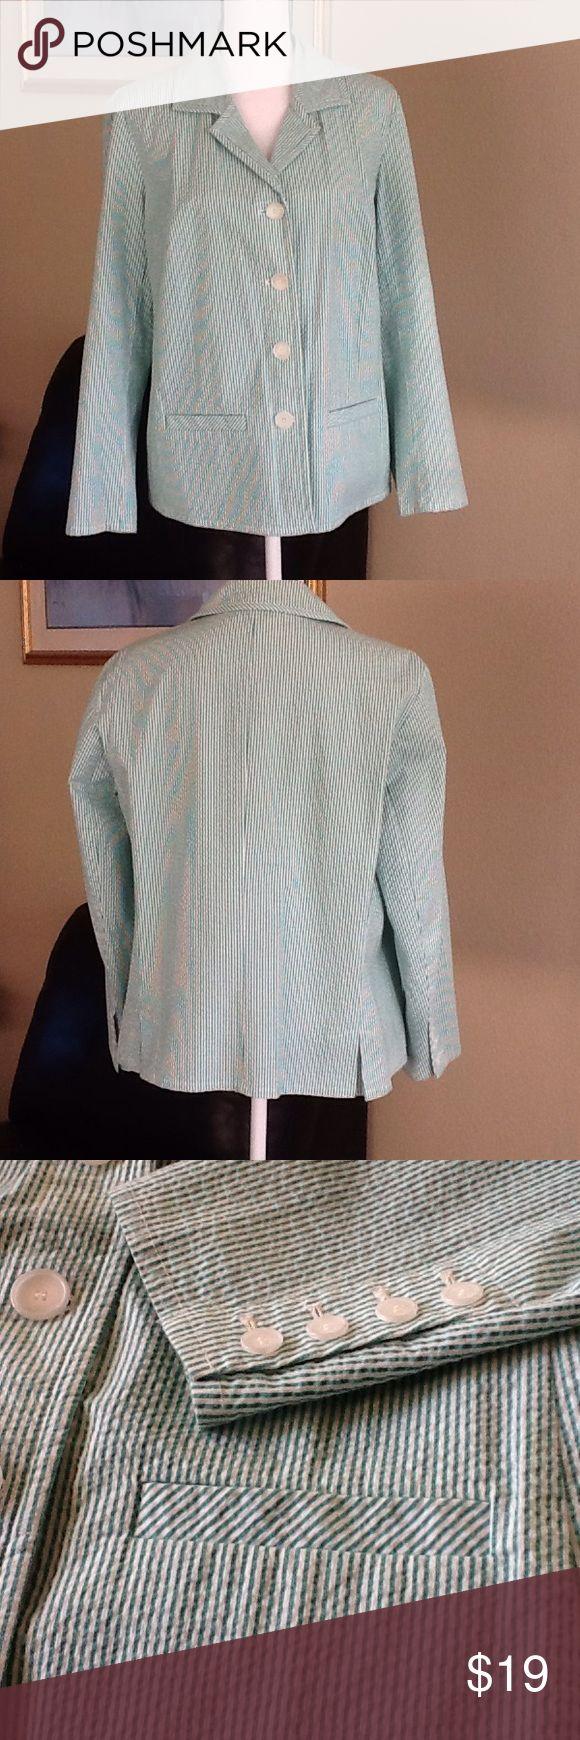 Talbots woman petites stretch seersucker jacket Green & white seersucker stripes - ready for Spring! 95% cotton, 5% spandex; machine wash cold. Good used condition. Talbots Jackets & Coats Blazers